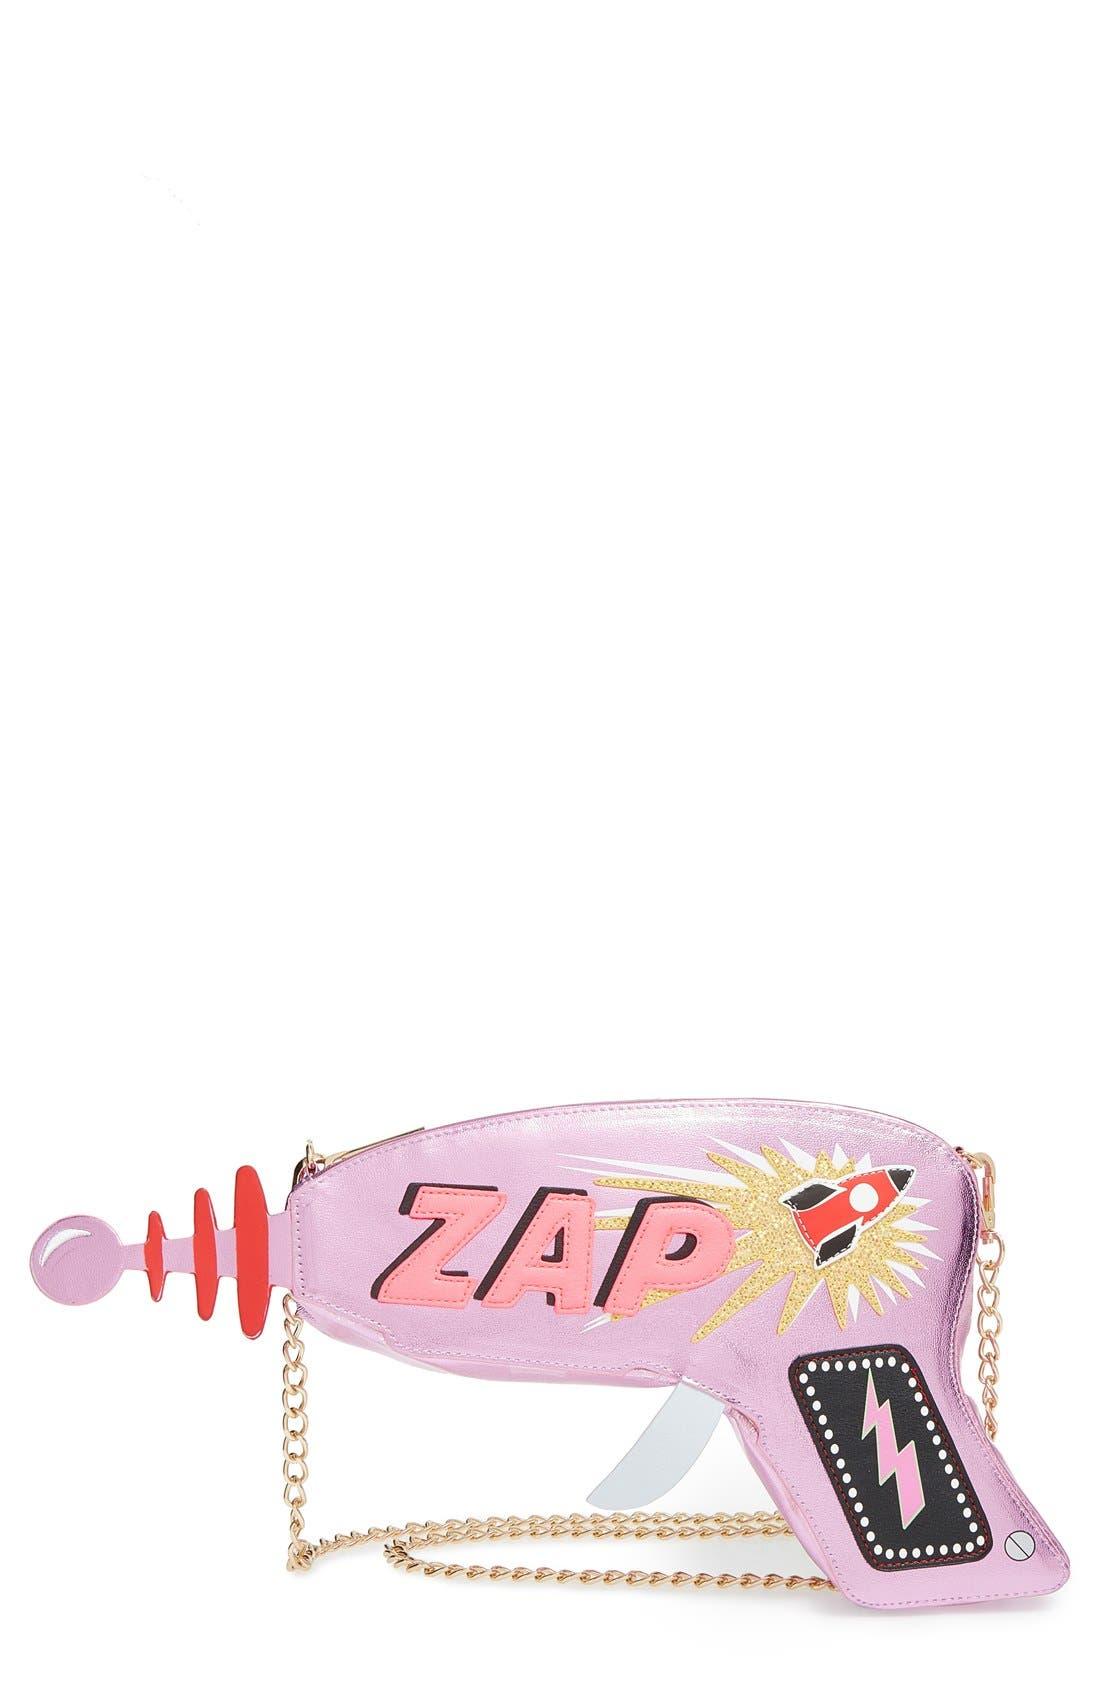 Main Image - Skinnydip 'ZAP' Convertible Clutch